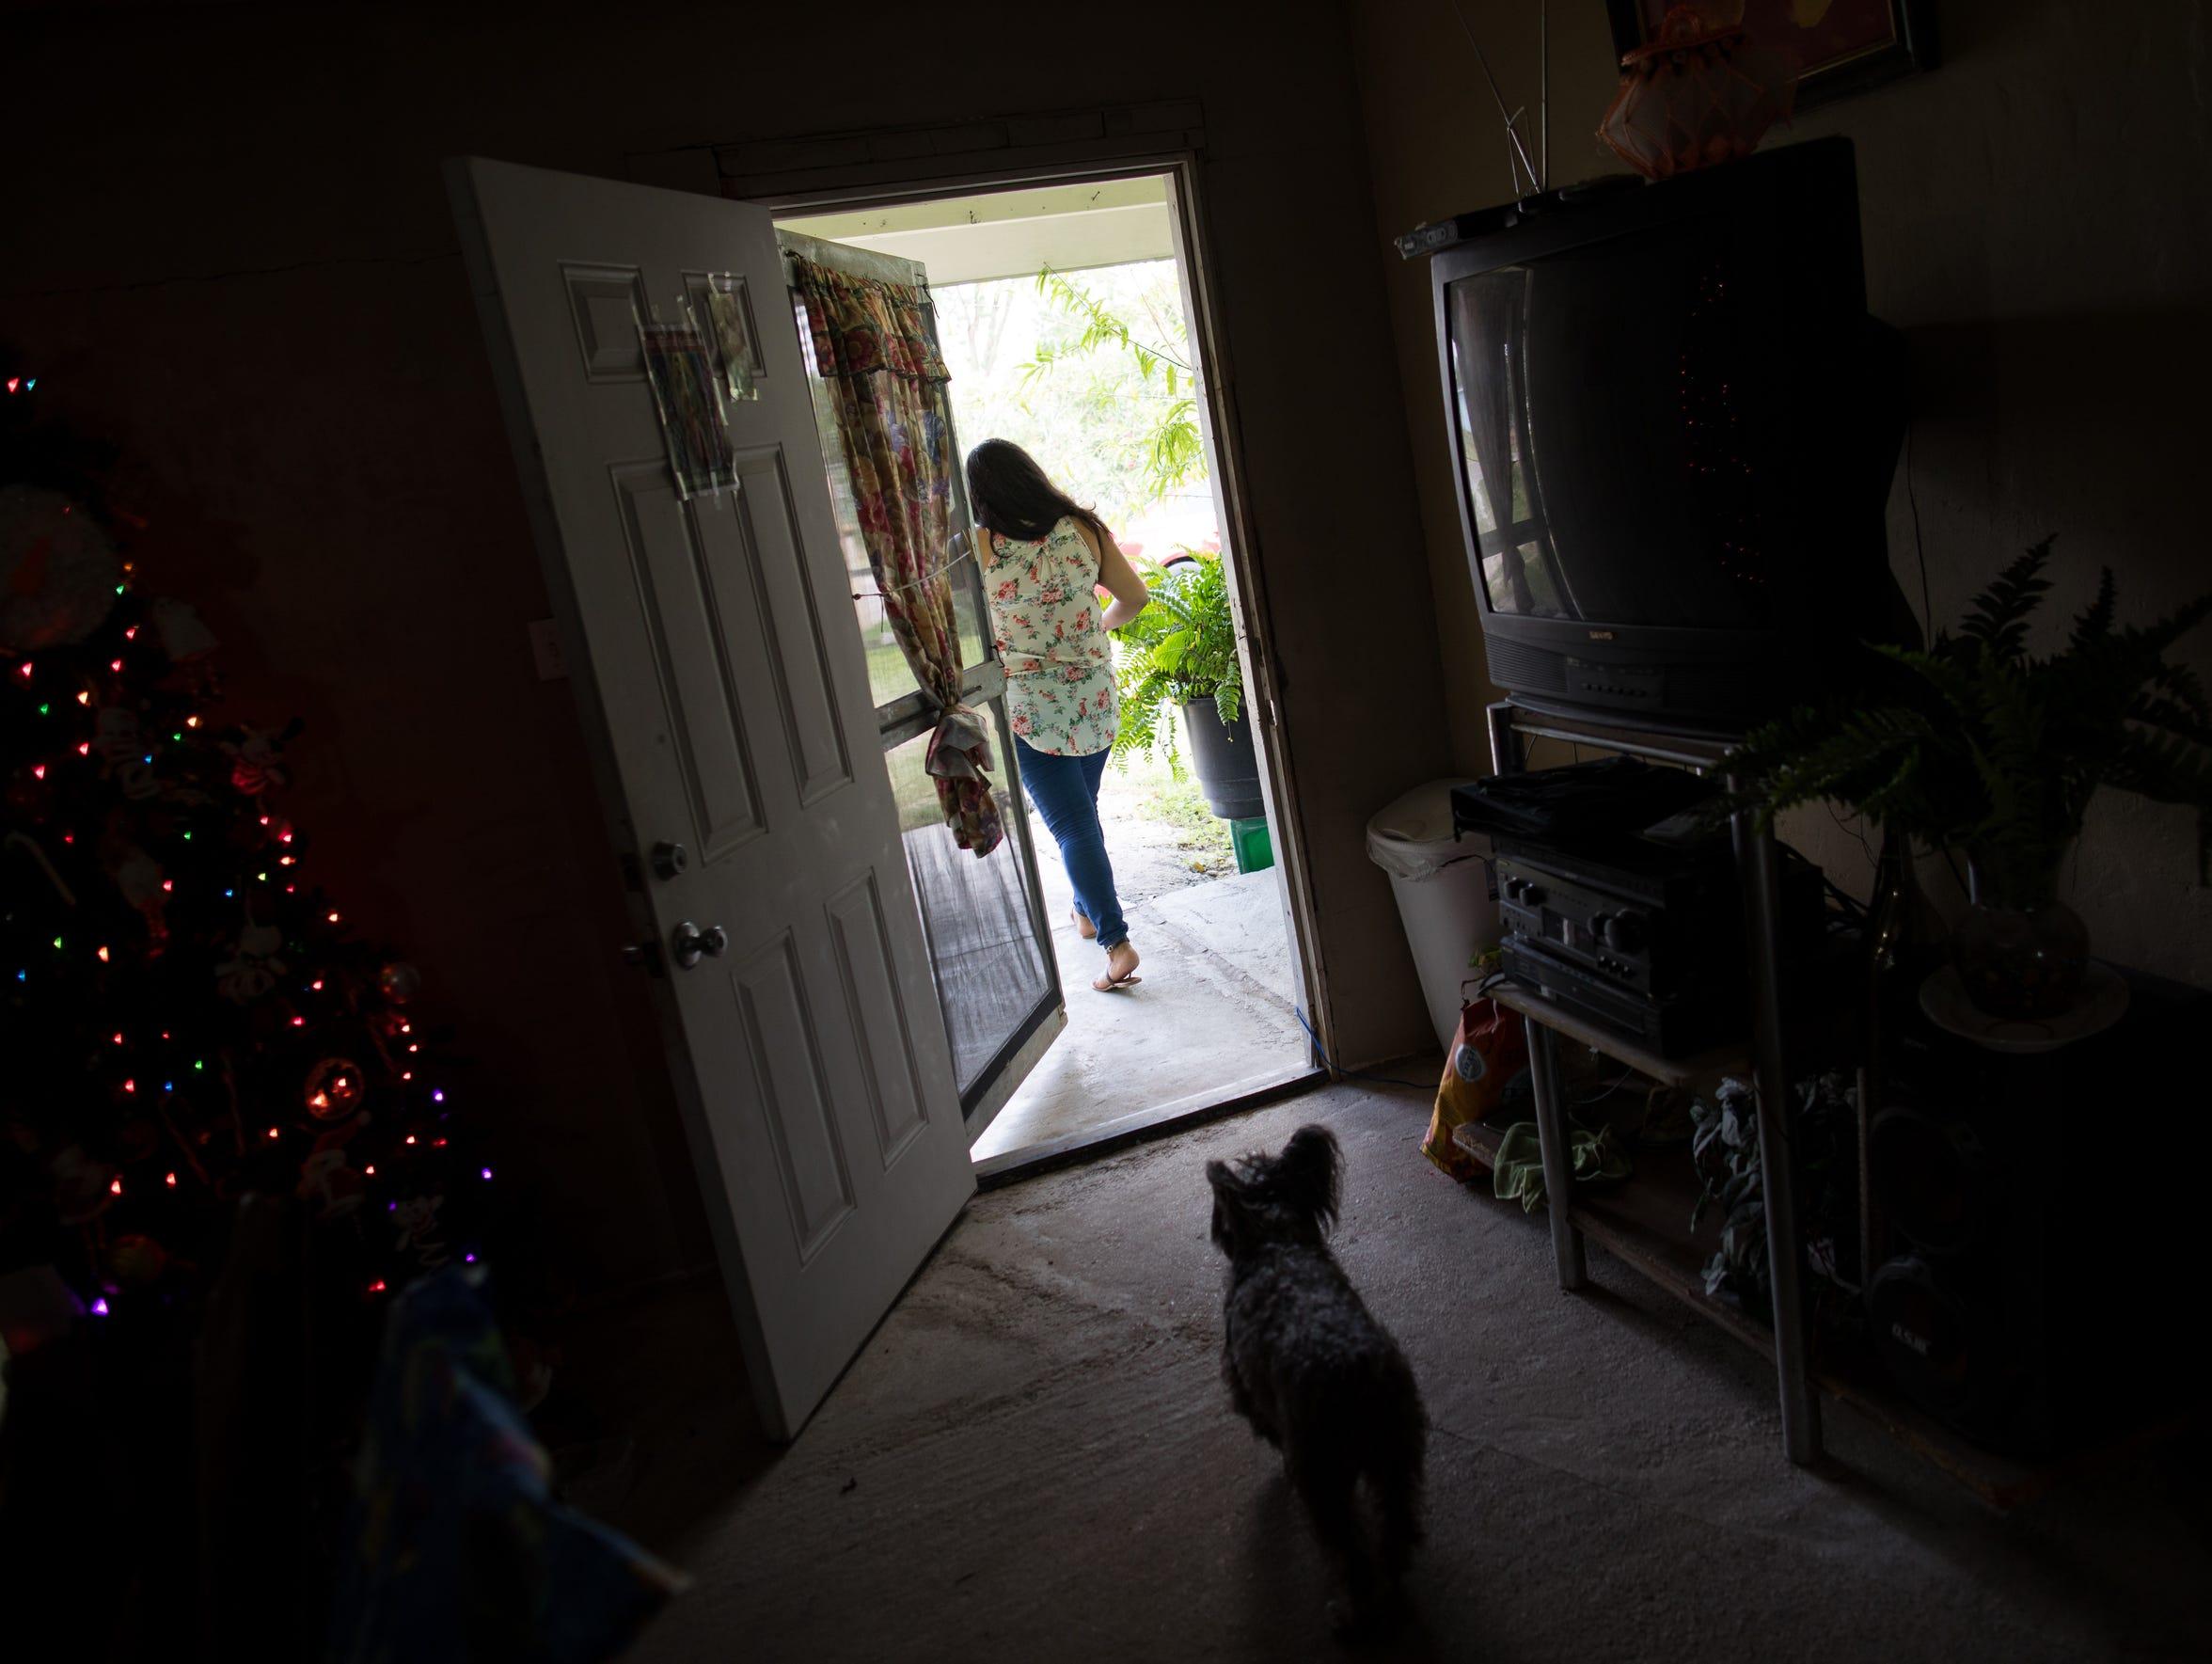 Mia Maria Hernandez's dog follows her as she walks